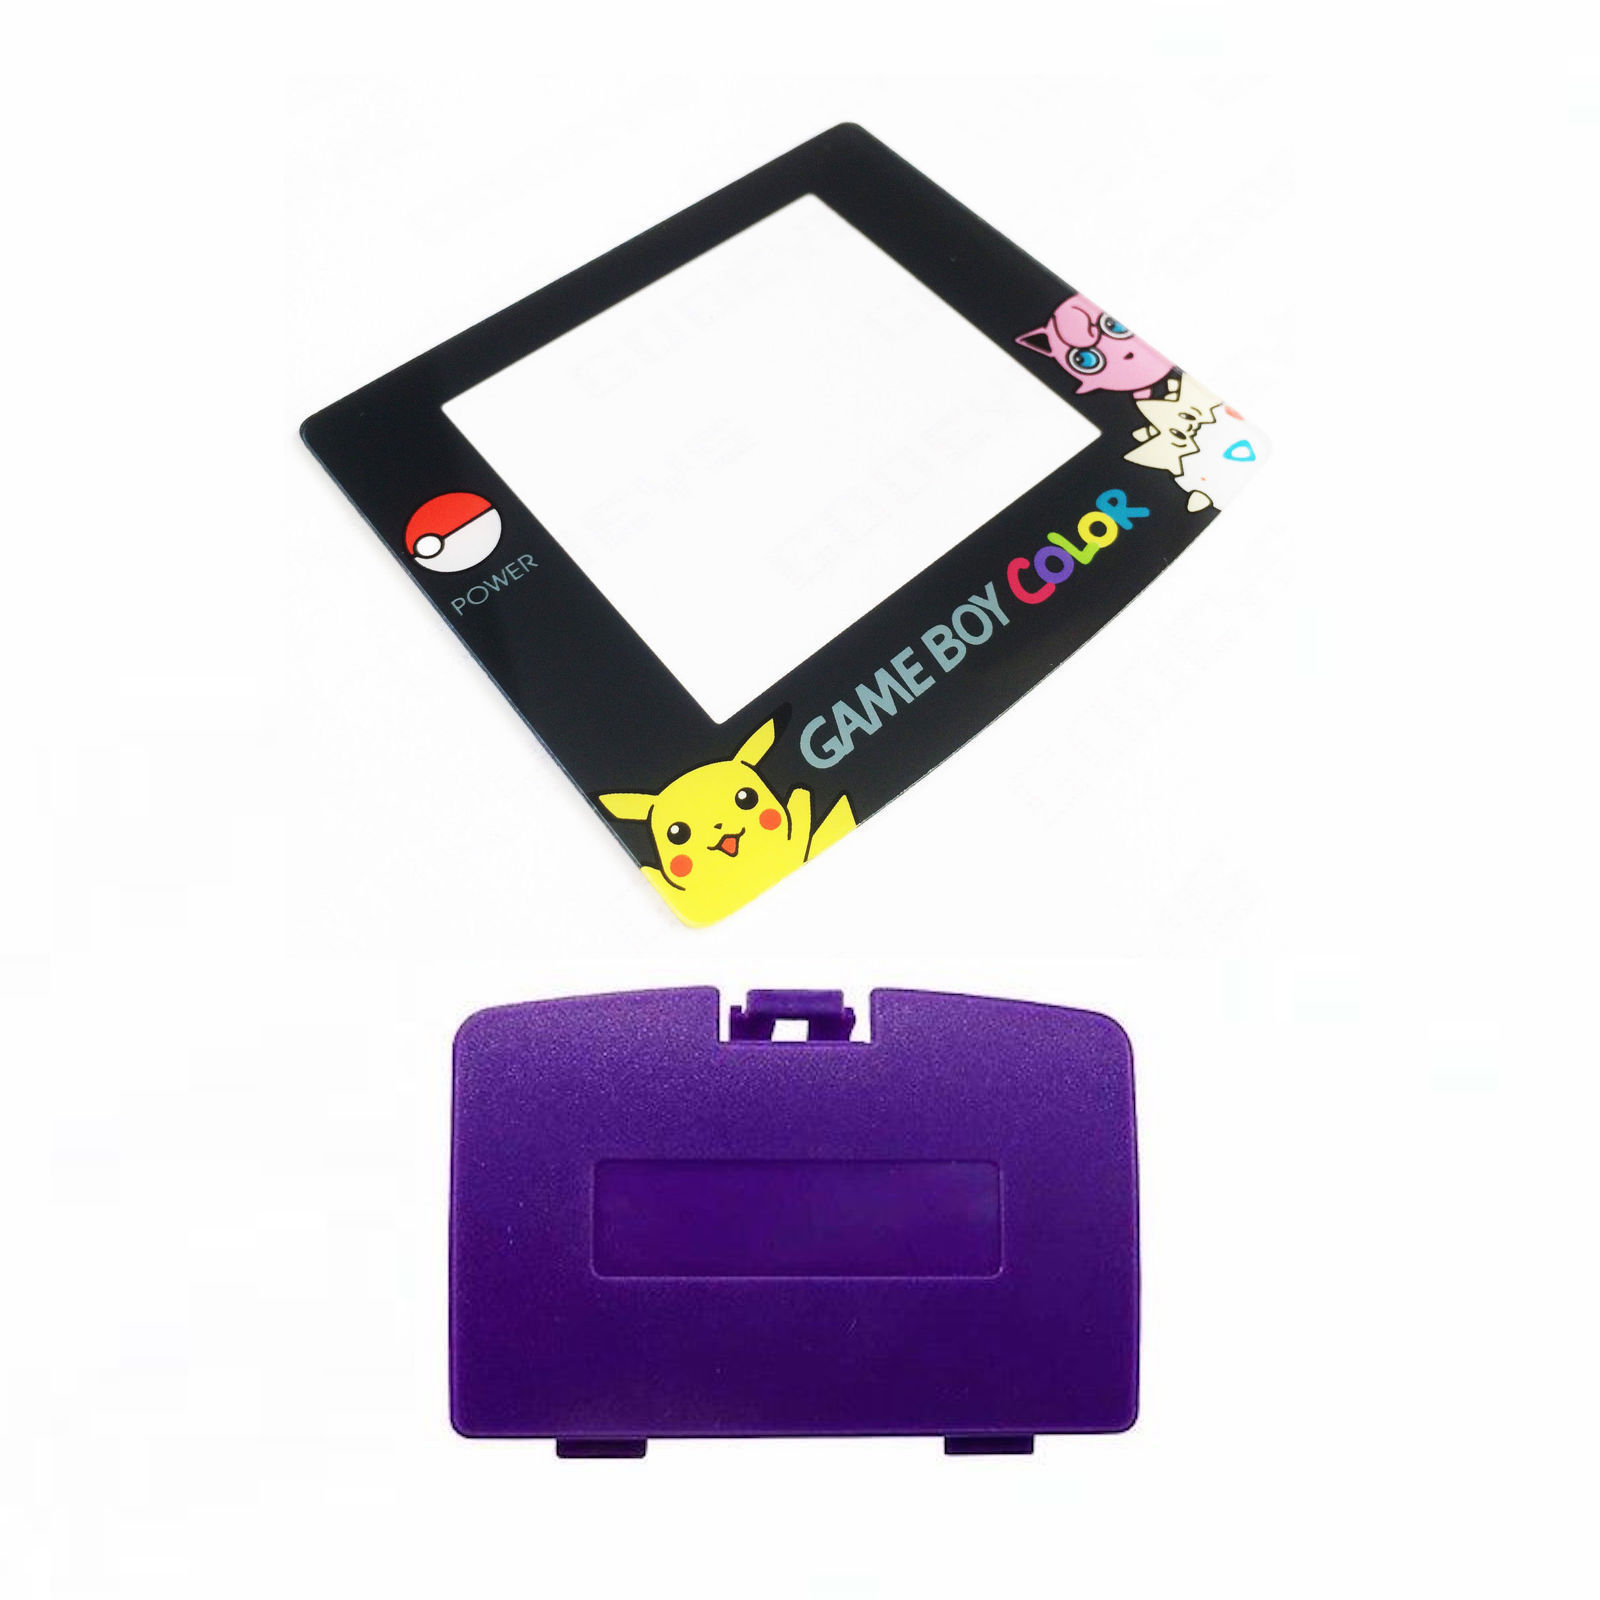 New GRAPE PURPLE Game Boy Color Battery Cover + Pokemon Jigglypuff Screen GBC